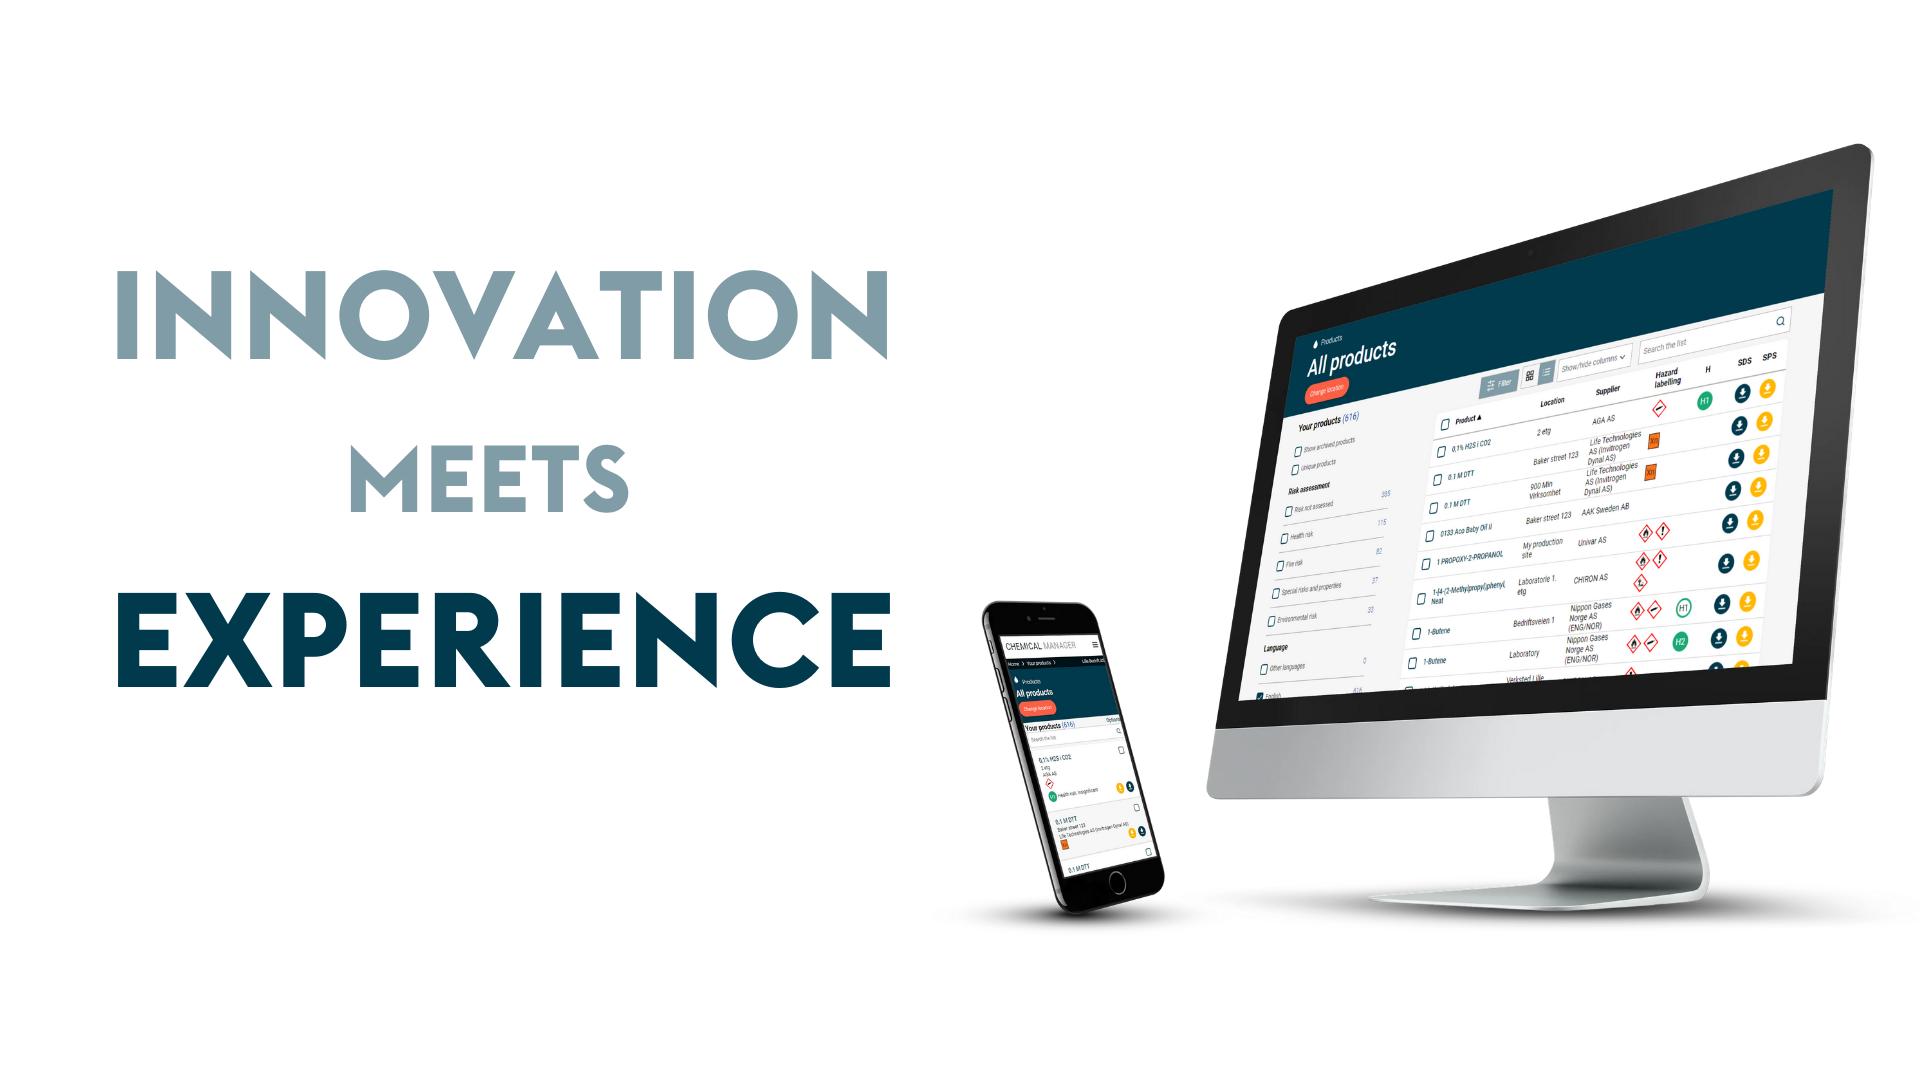 CM_Innovation_Image